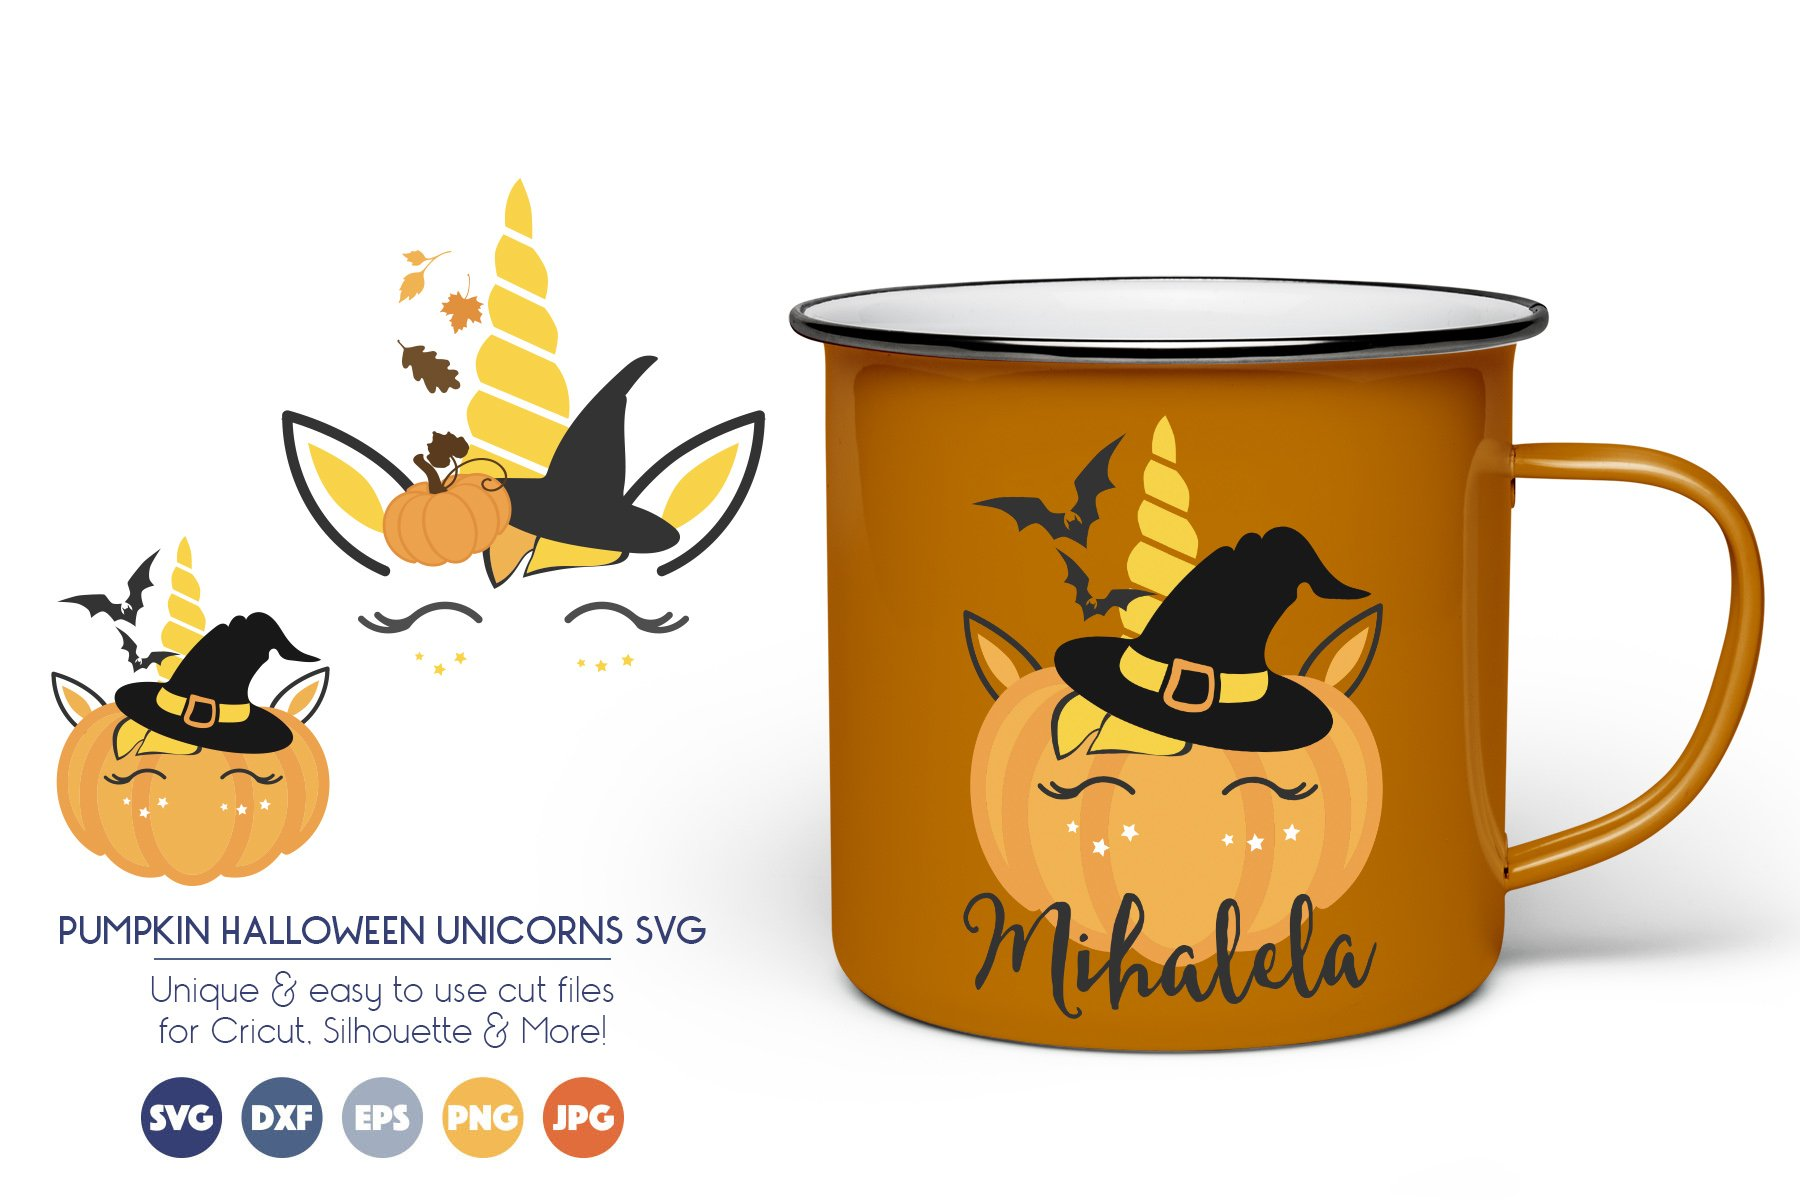 Pumpkin Halloween Unicorn SVG Cut Files example image 1